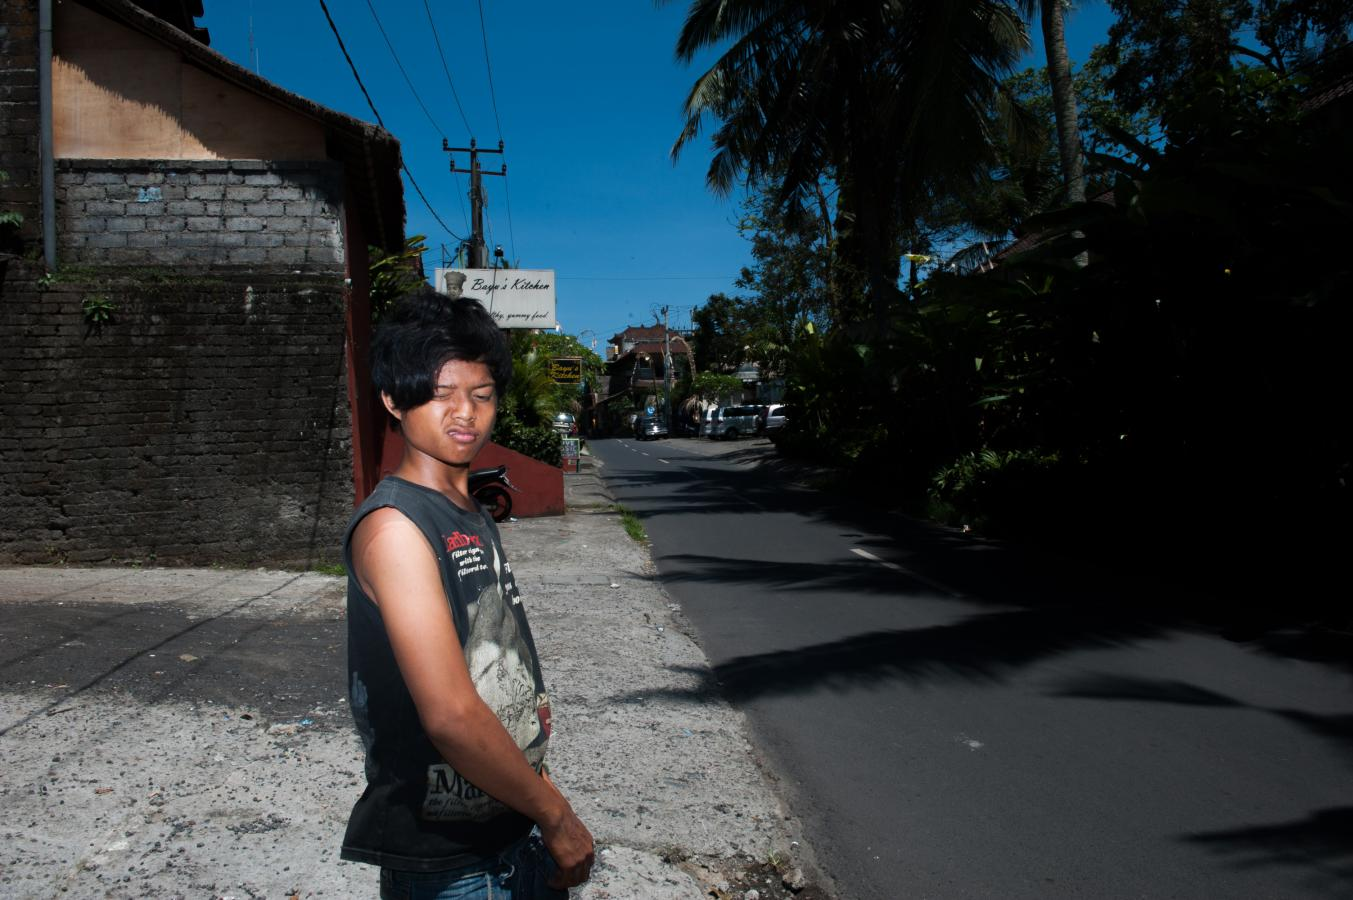 boy-in-the-street-ubud-bali-2013